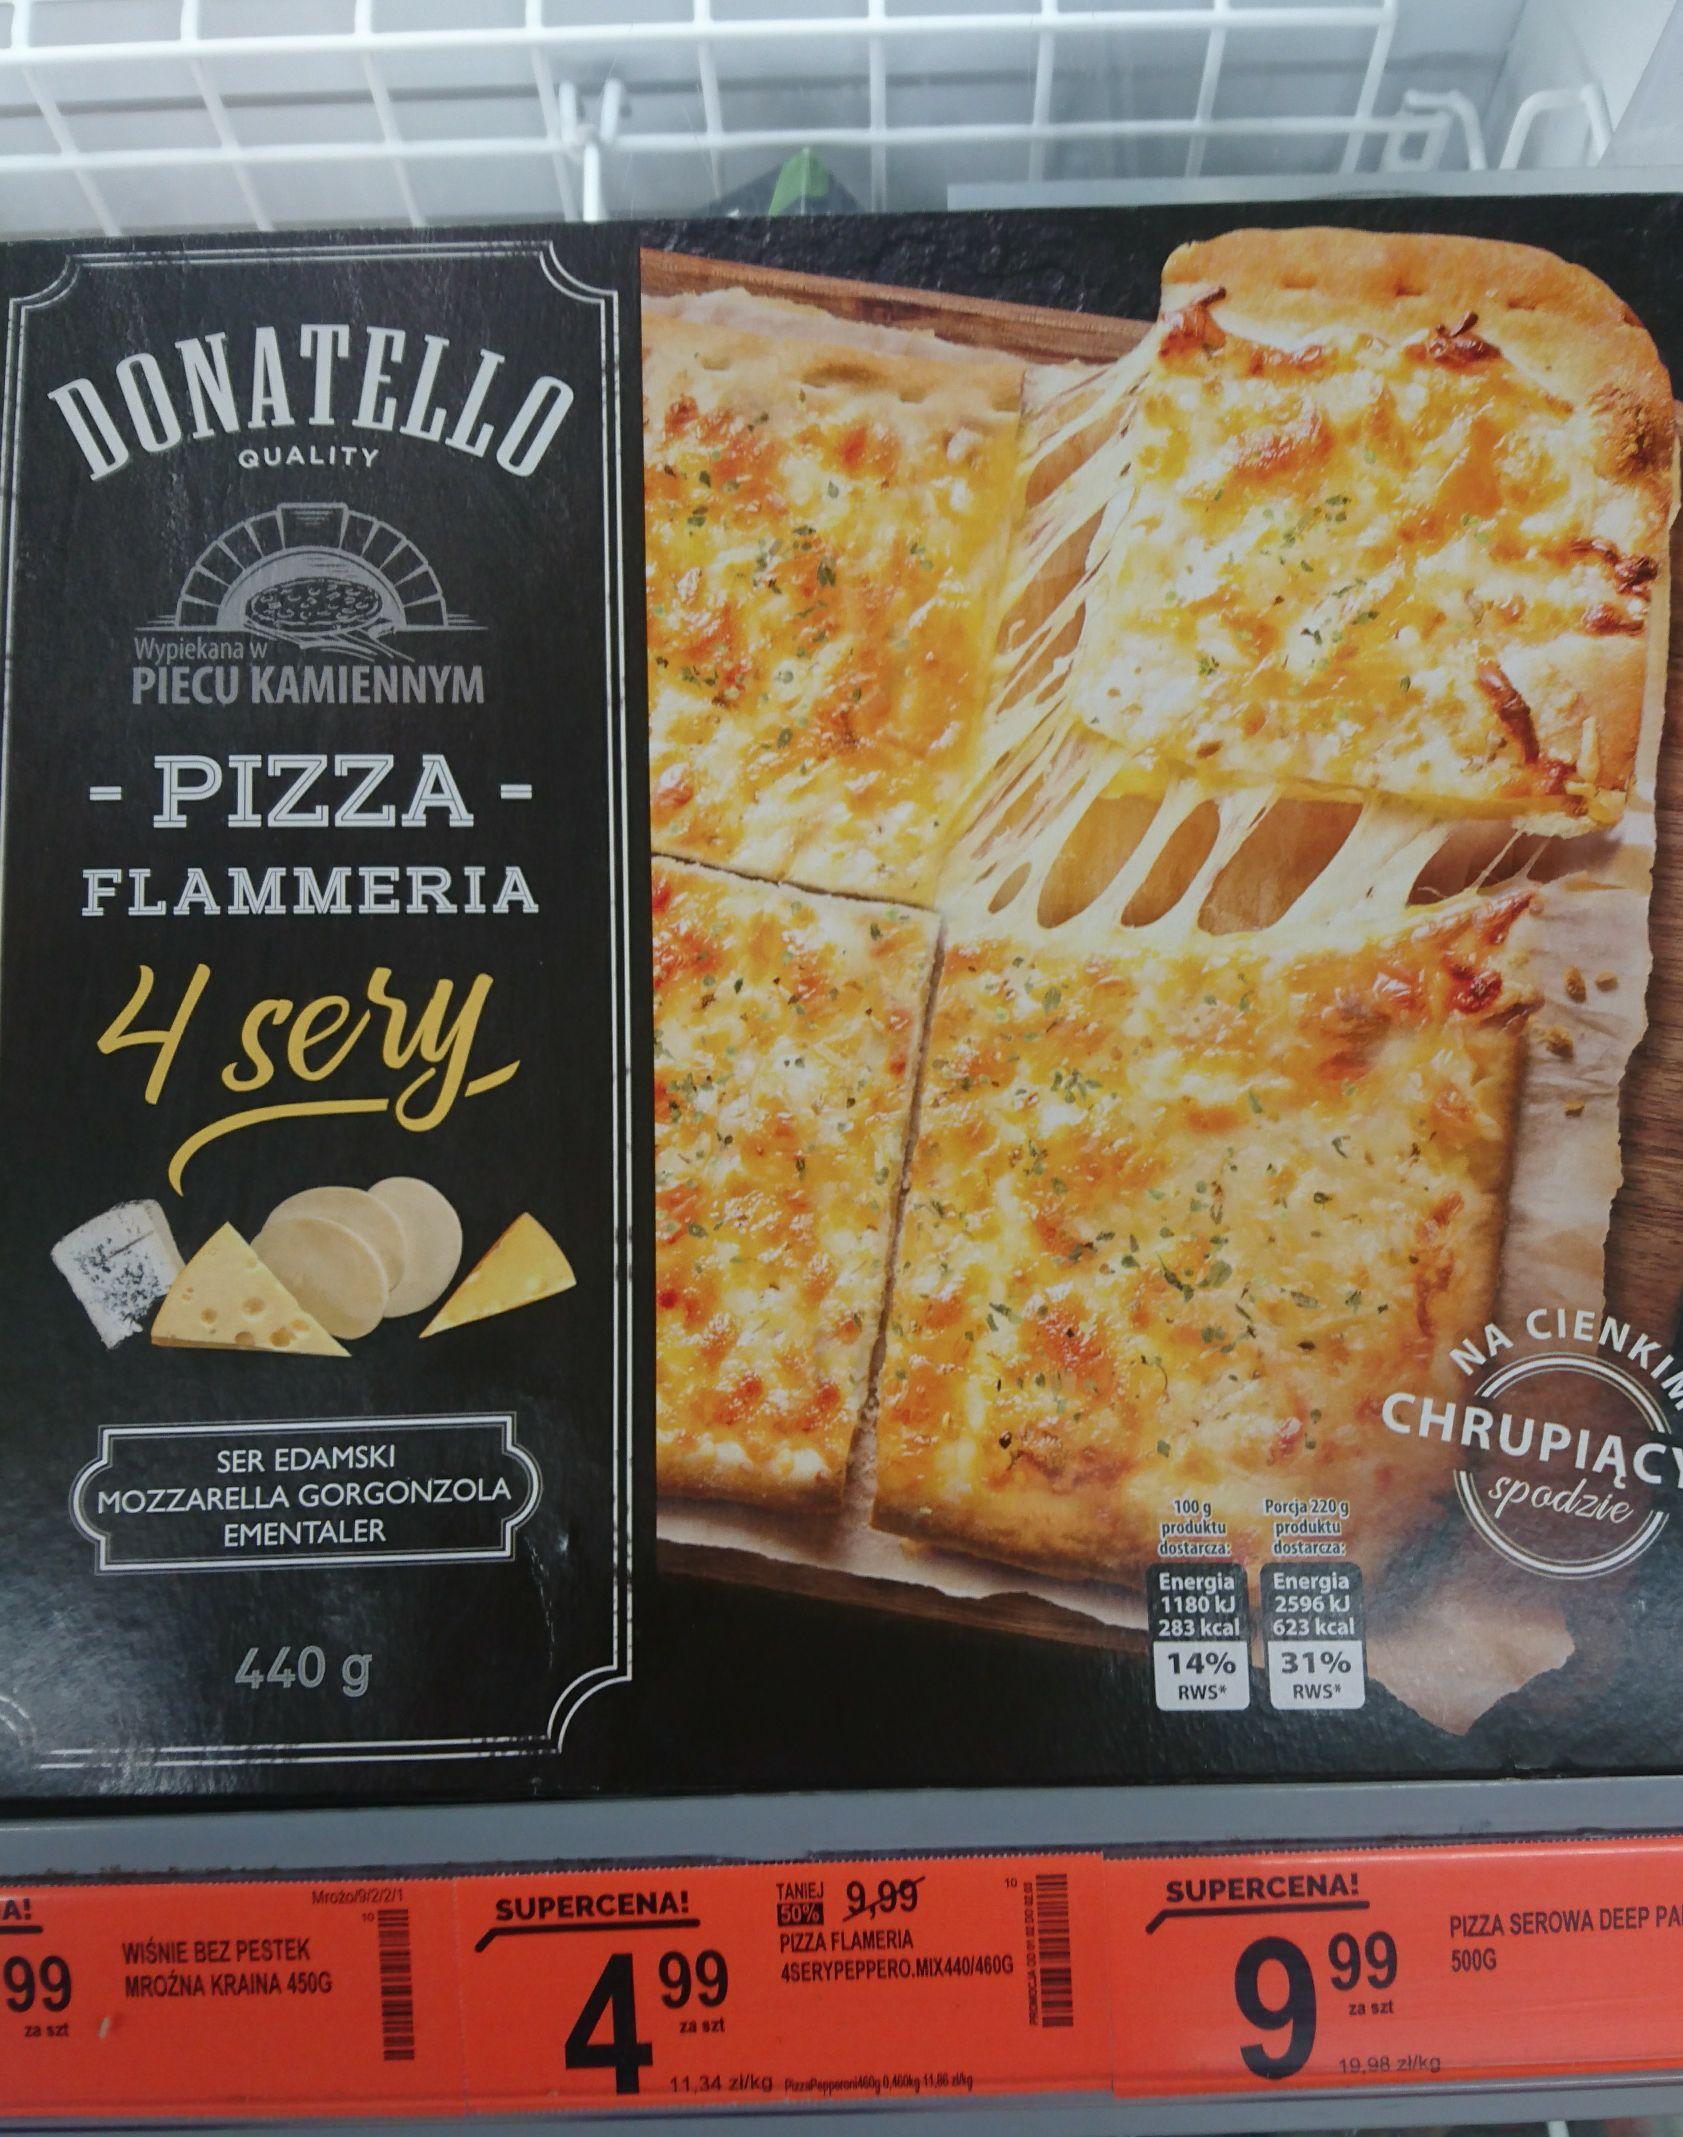 Pizza Flammeria 4 sery 440g